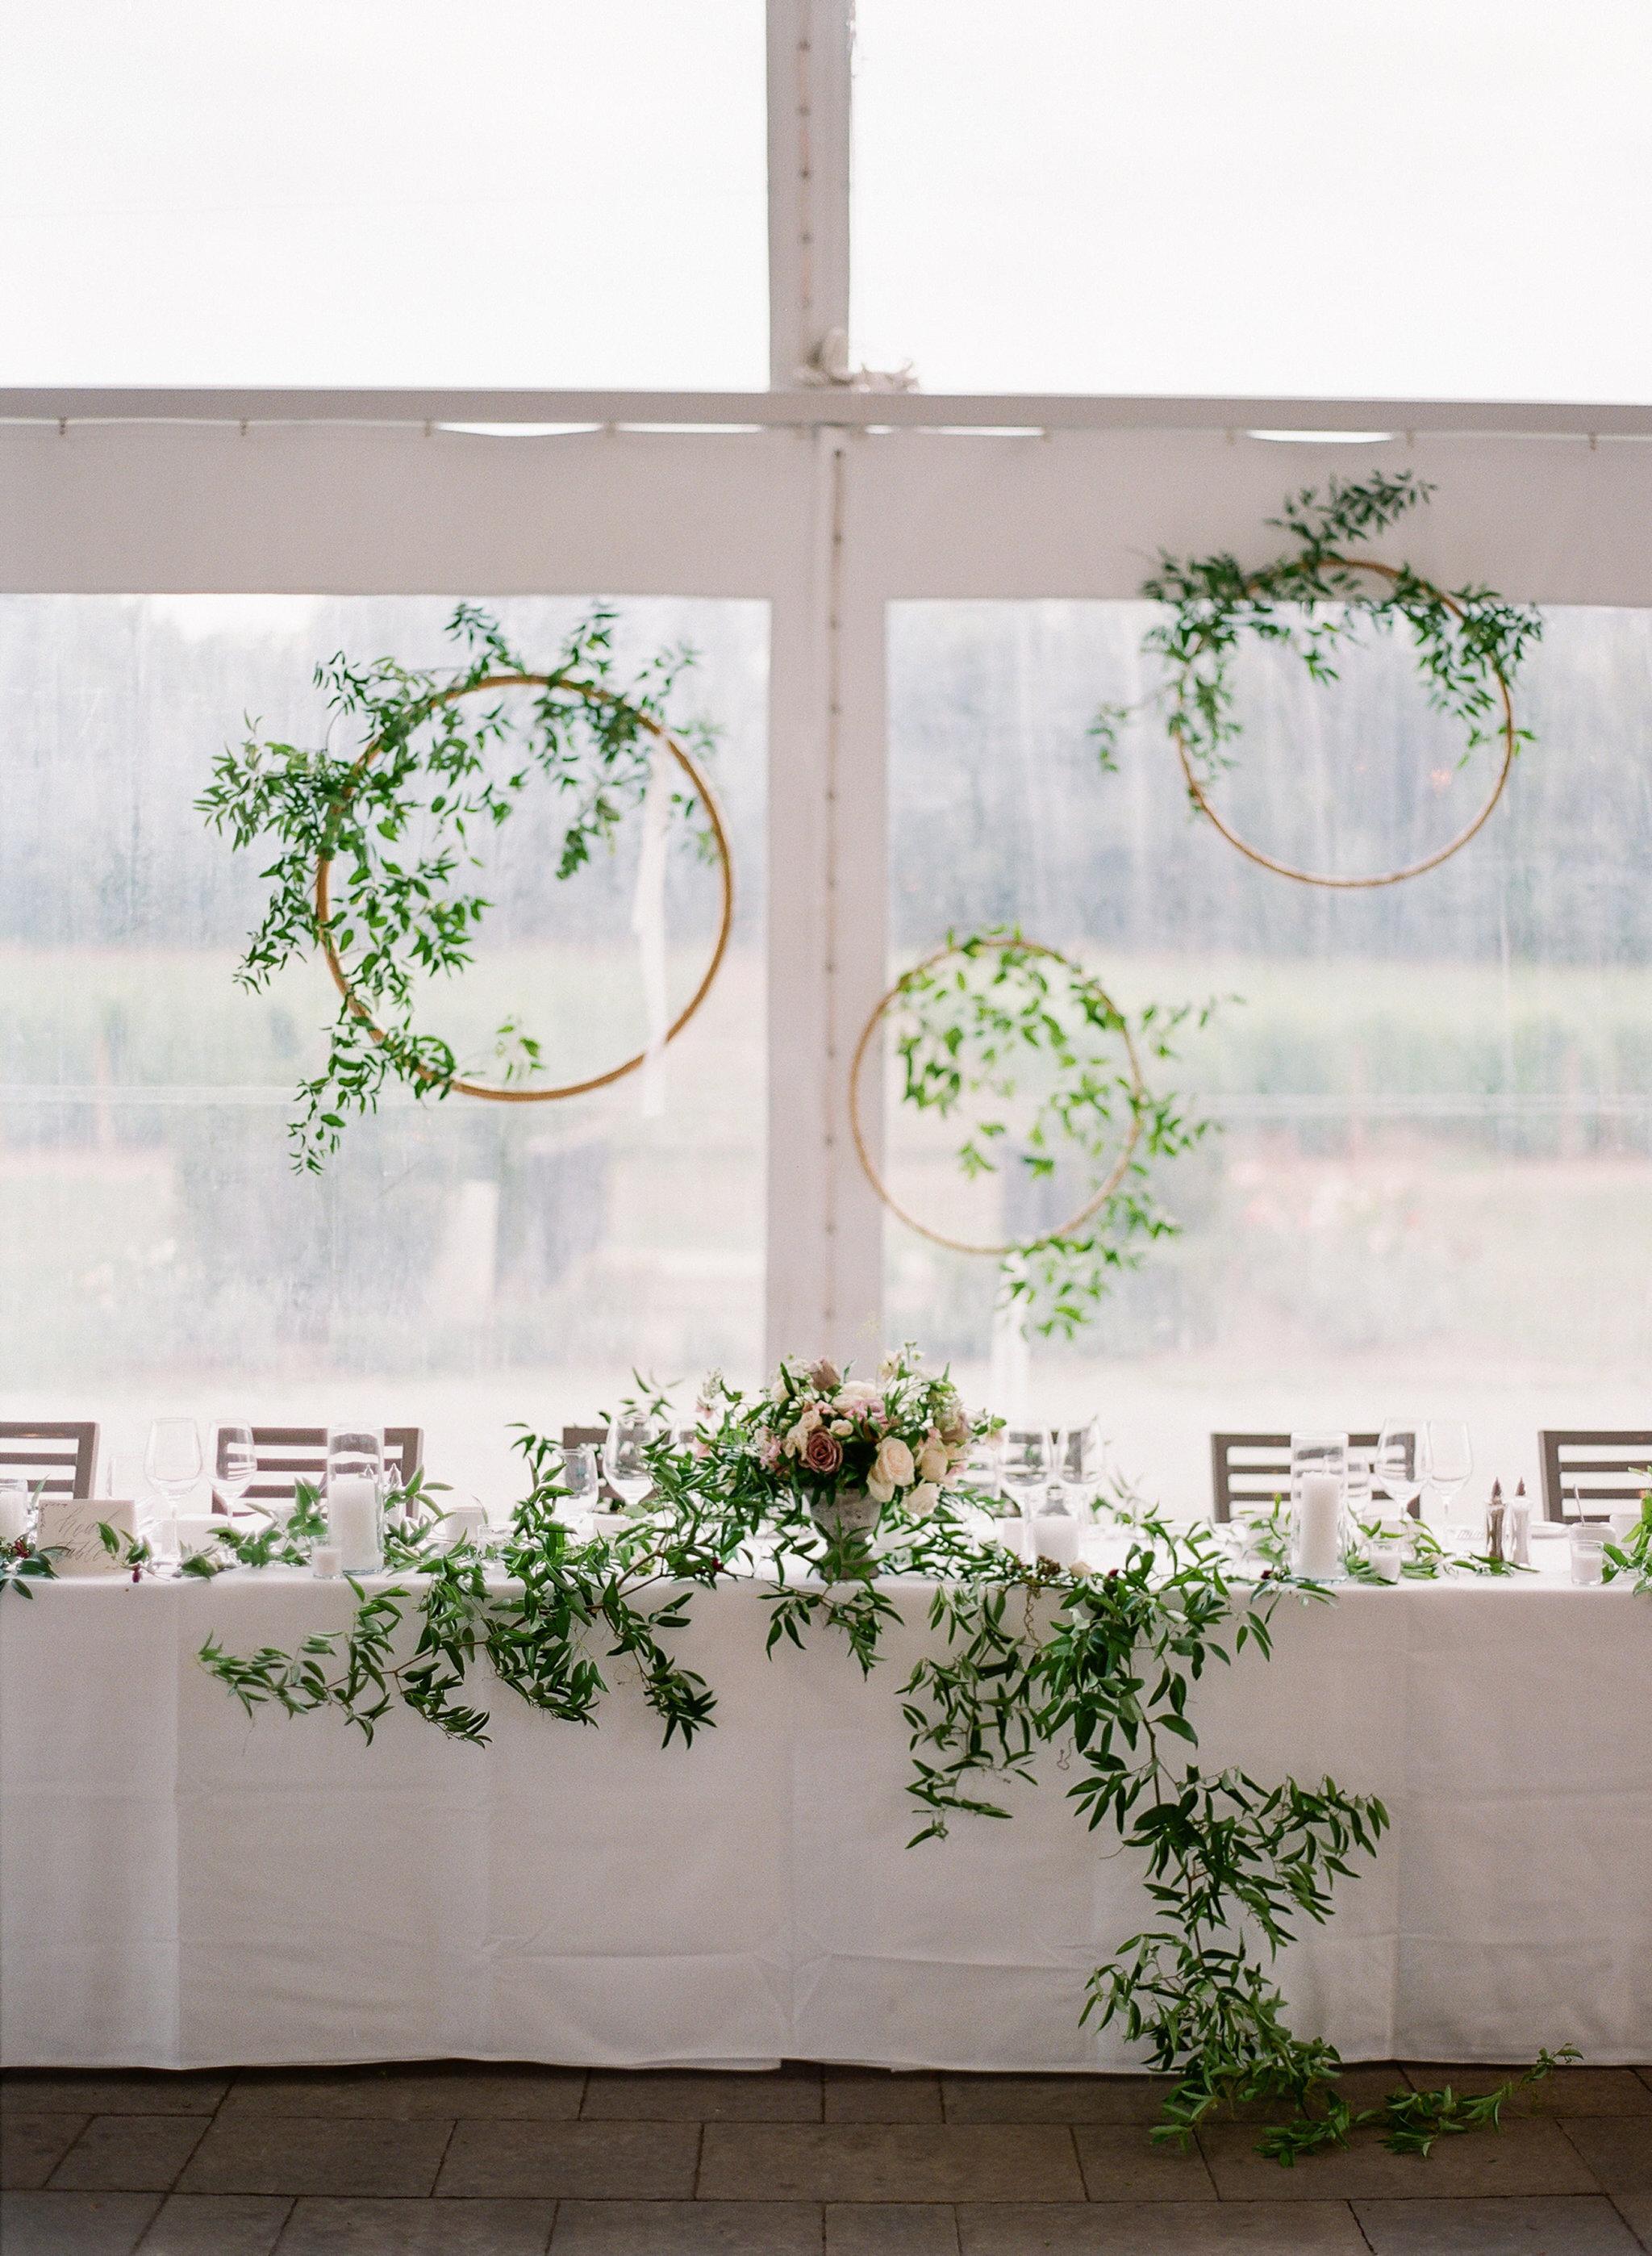 1054-artiese-chateau-des-charmes-wedding-sonia-tim-000095320002.jpg